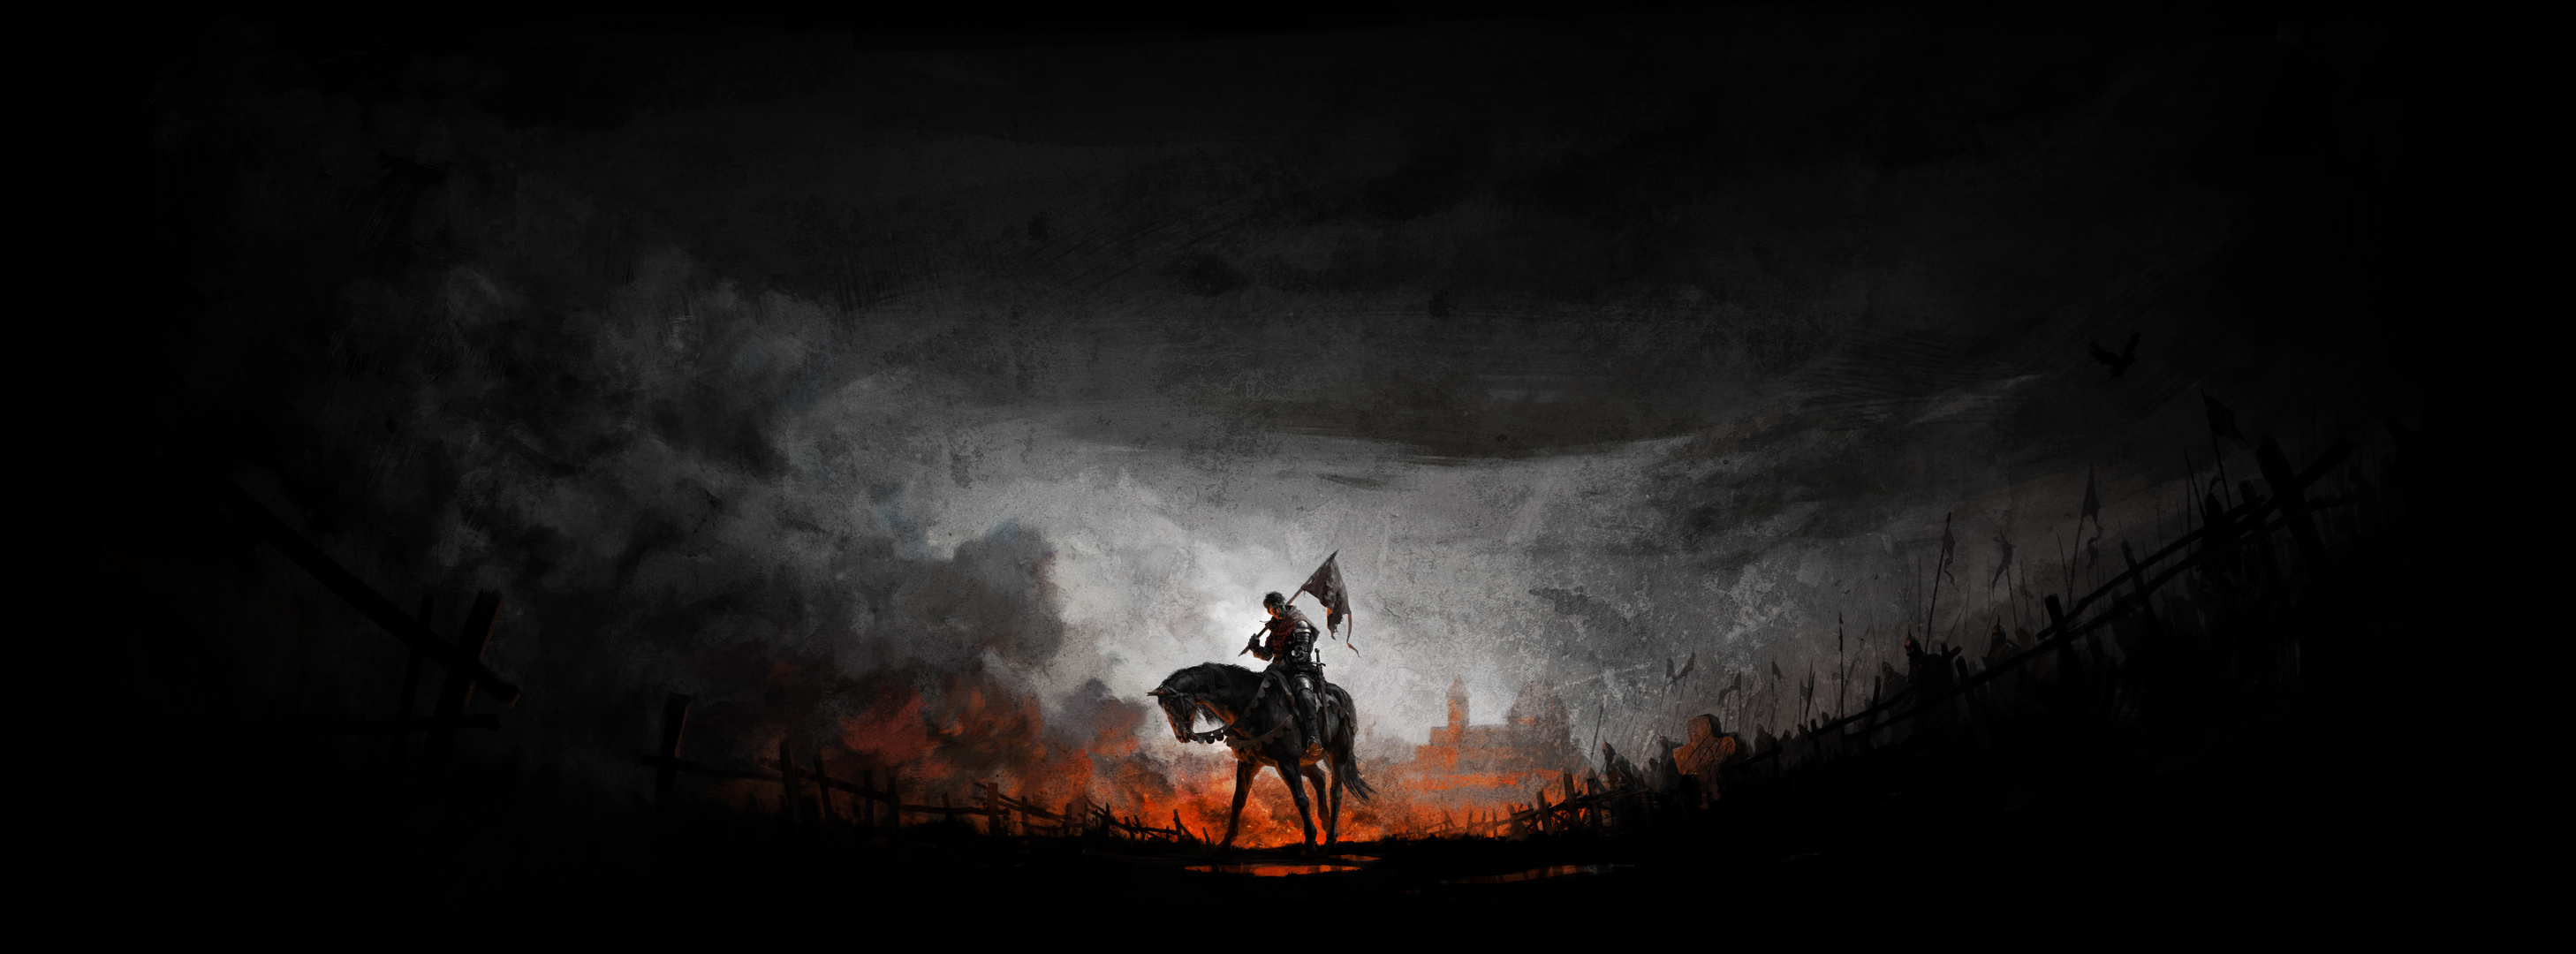 Kingdom Come Deliverance Game Artwork, HD Games, 4k ...